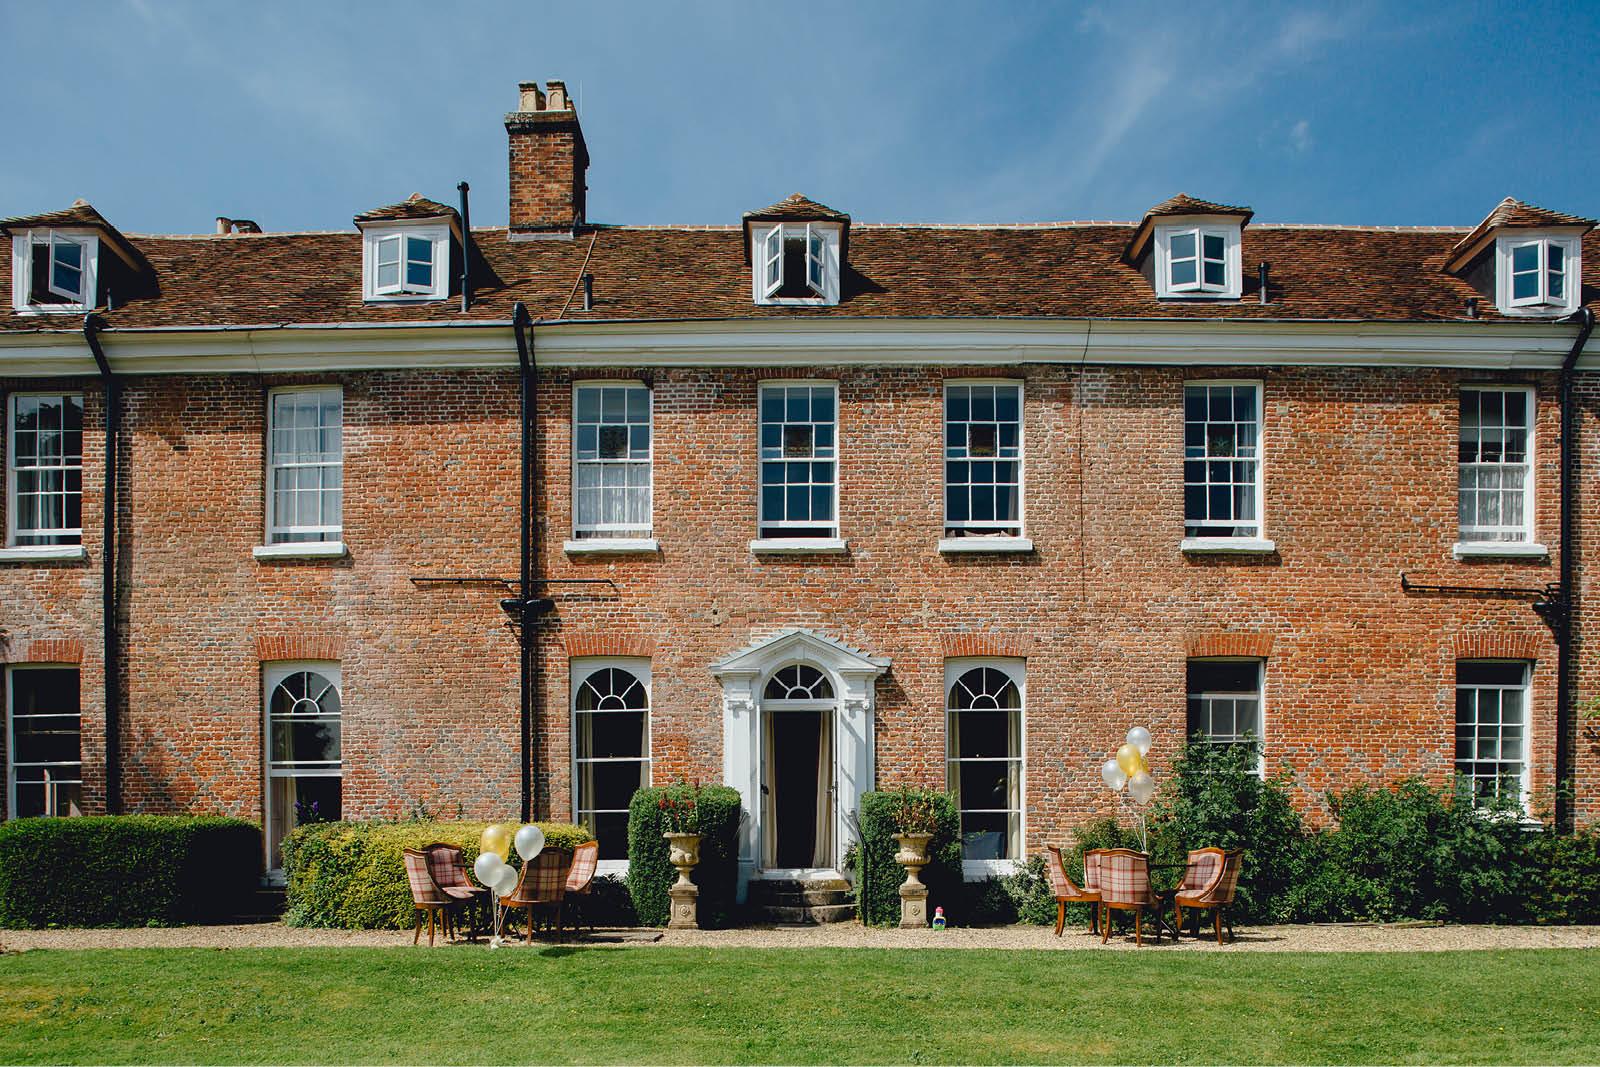 New Park Manor Hotel, Brockenhurst, Hampshire